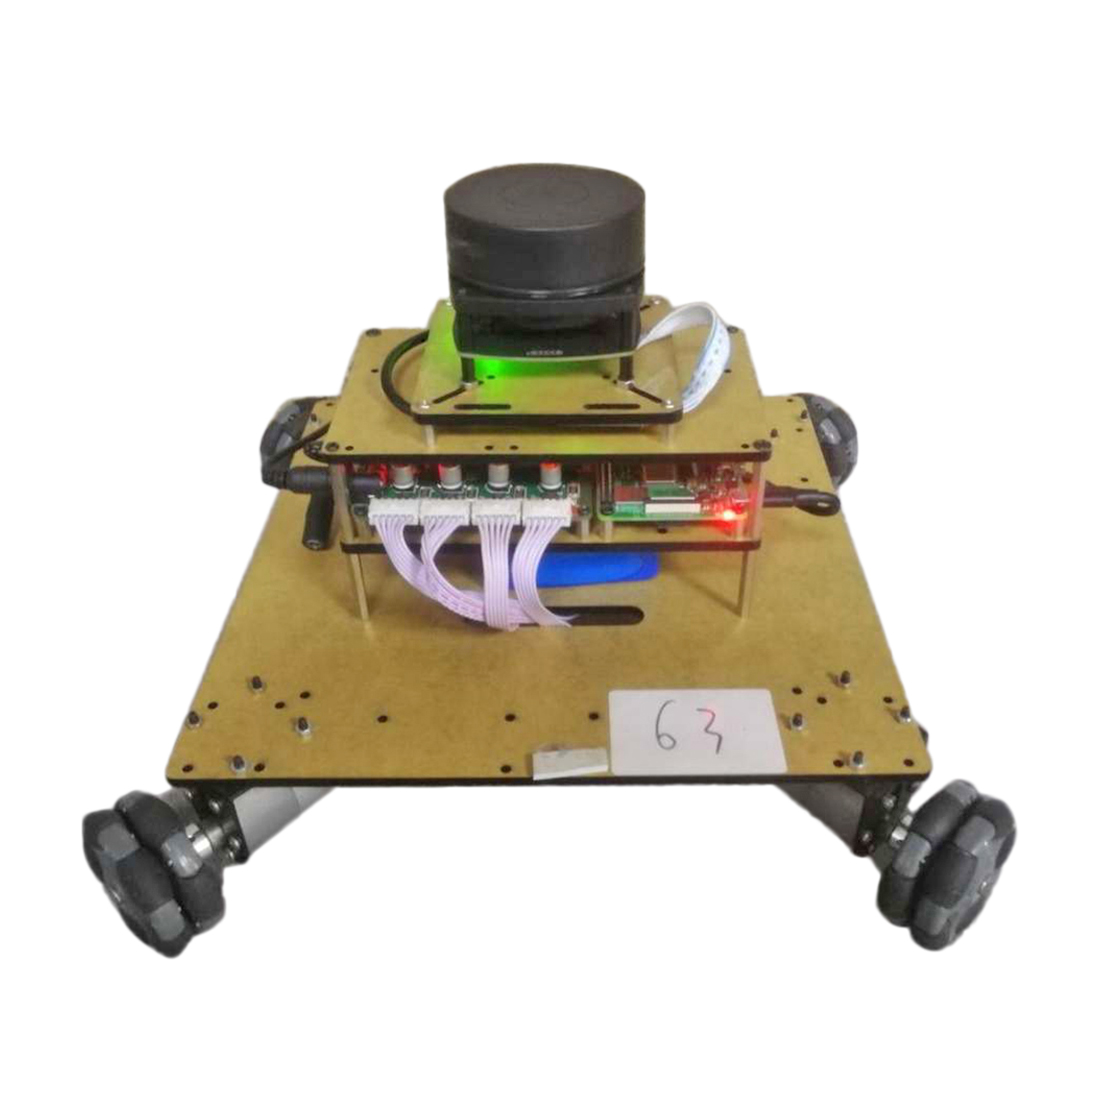 Robot Operating System Ailibot Omnidirectional Robot Car Kit Programmable Toys Set For Kids Adults Gift  - 03 / 04 Version